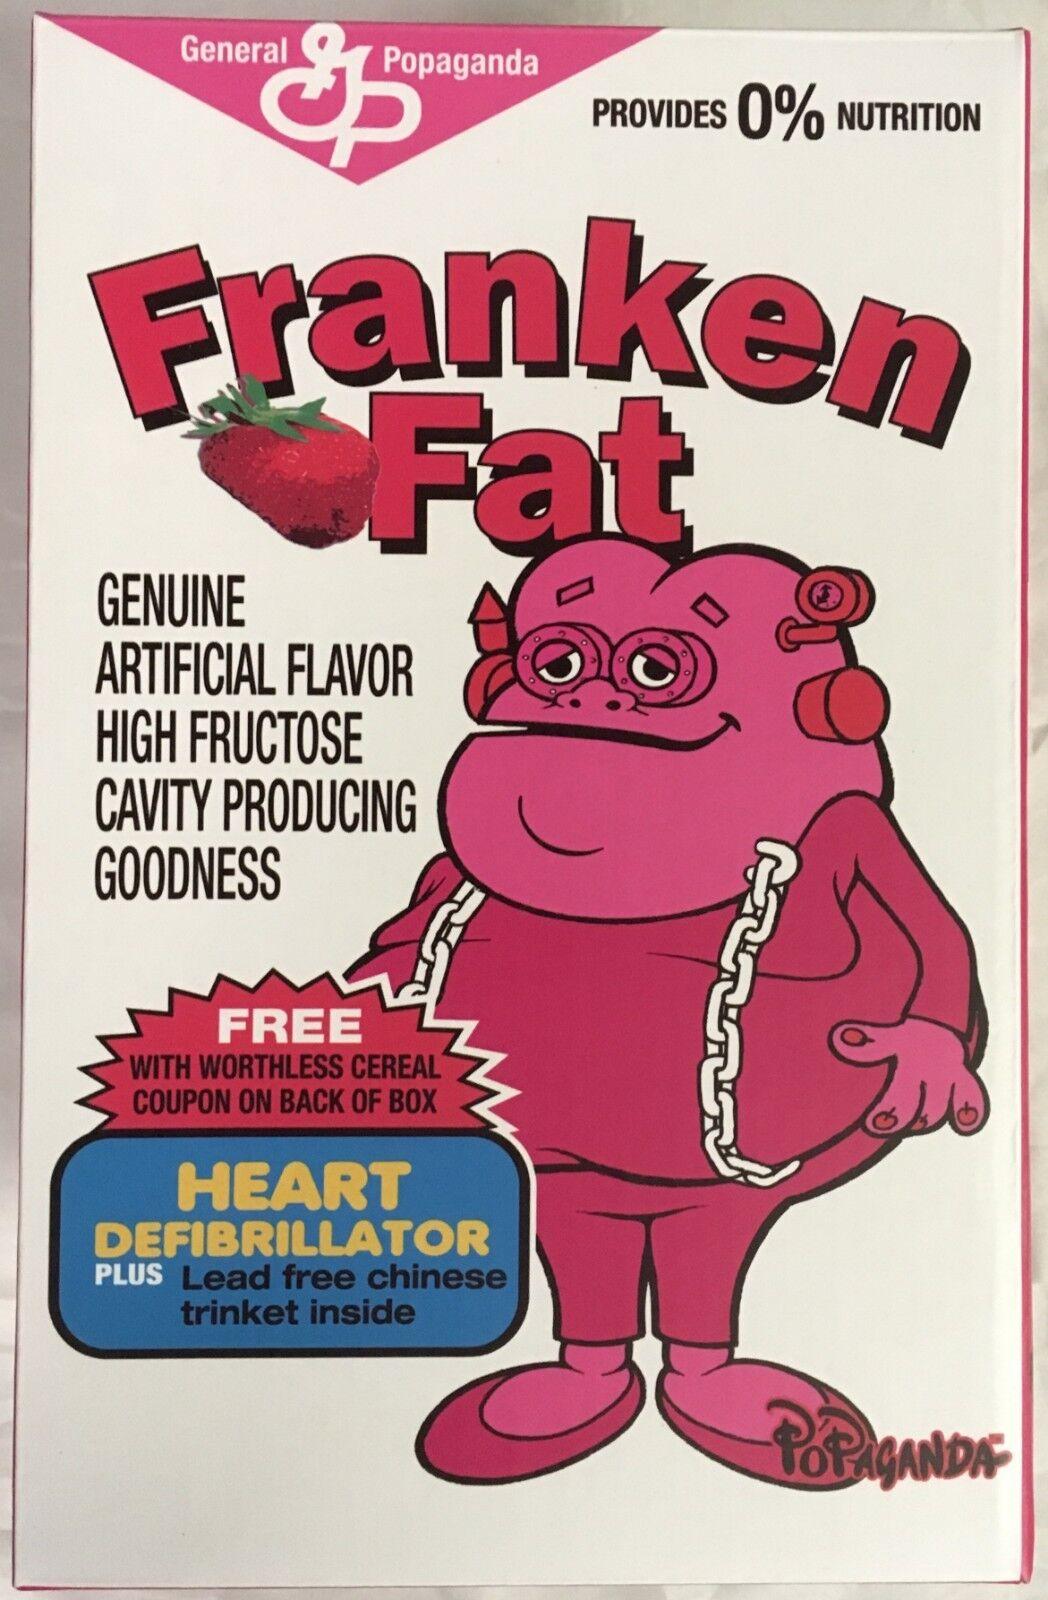 Franken Fat 8